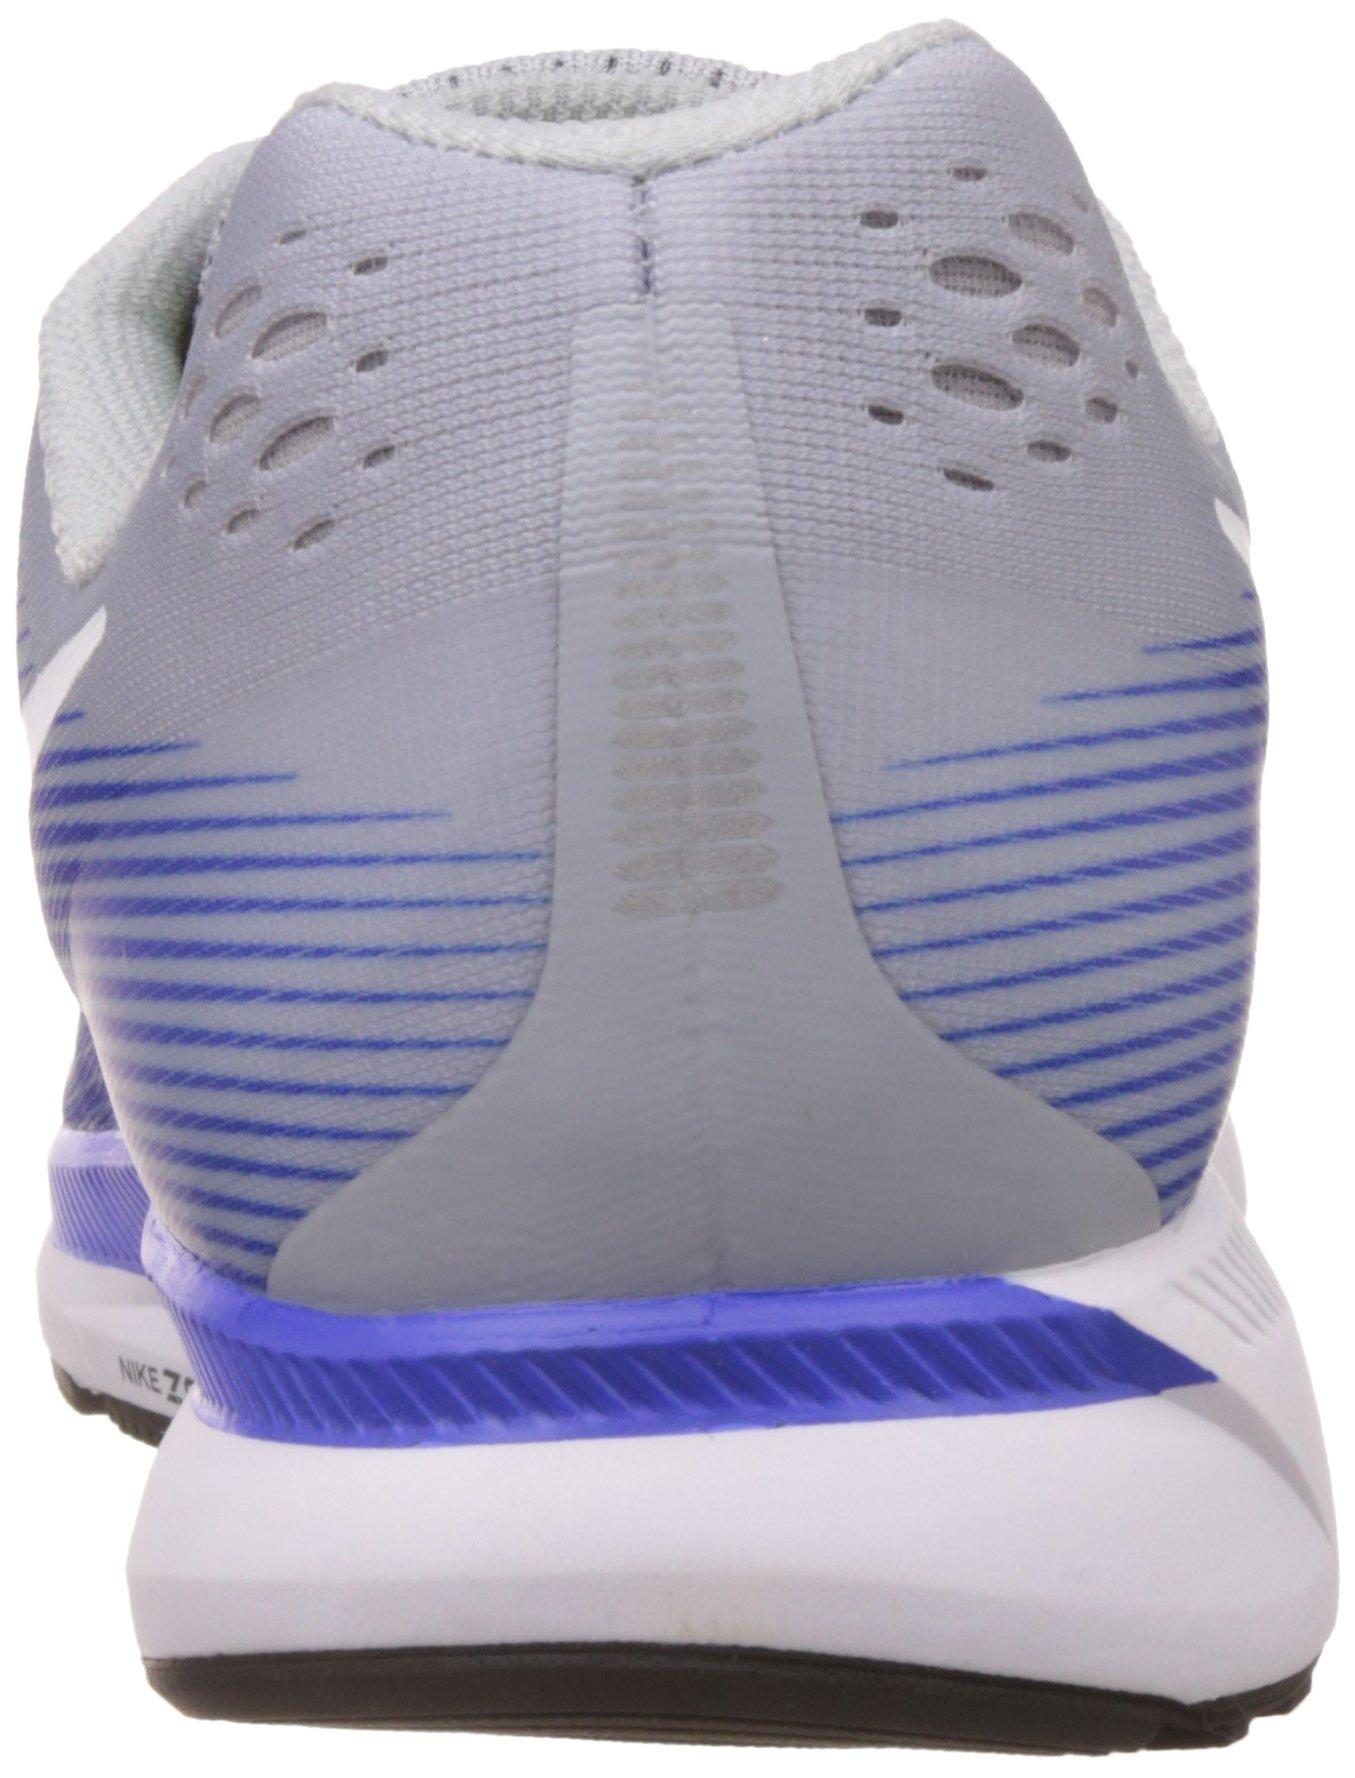 NIKE Mens Air Zoom Pegasus 34 Running Shoe (11 M US, Wolf Grey/White/Racer Blue) by Nike (Image #2)